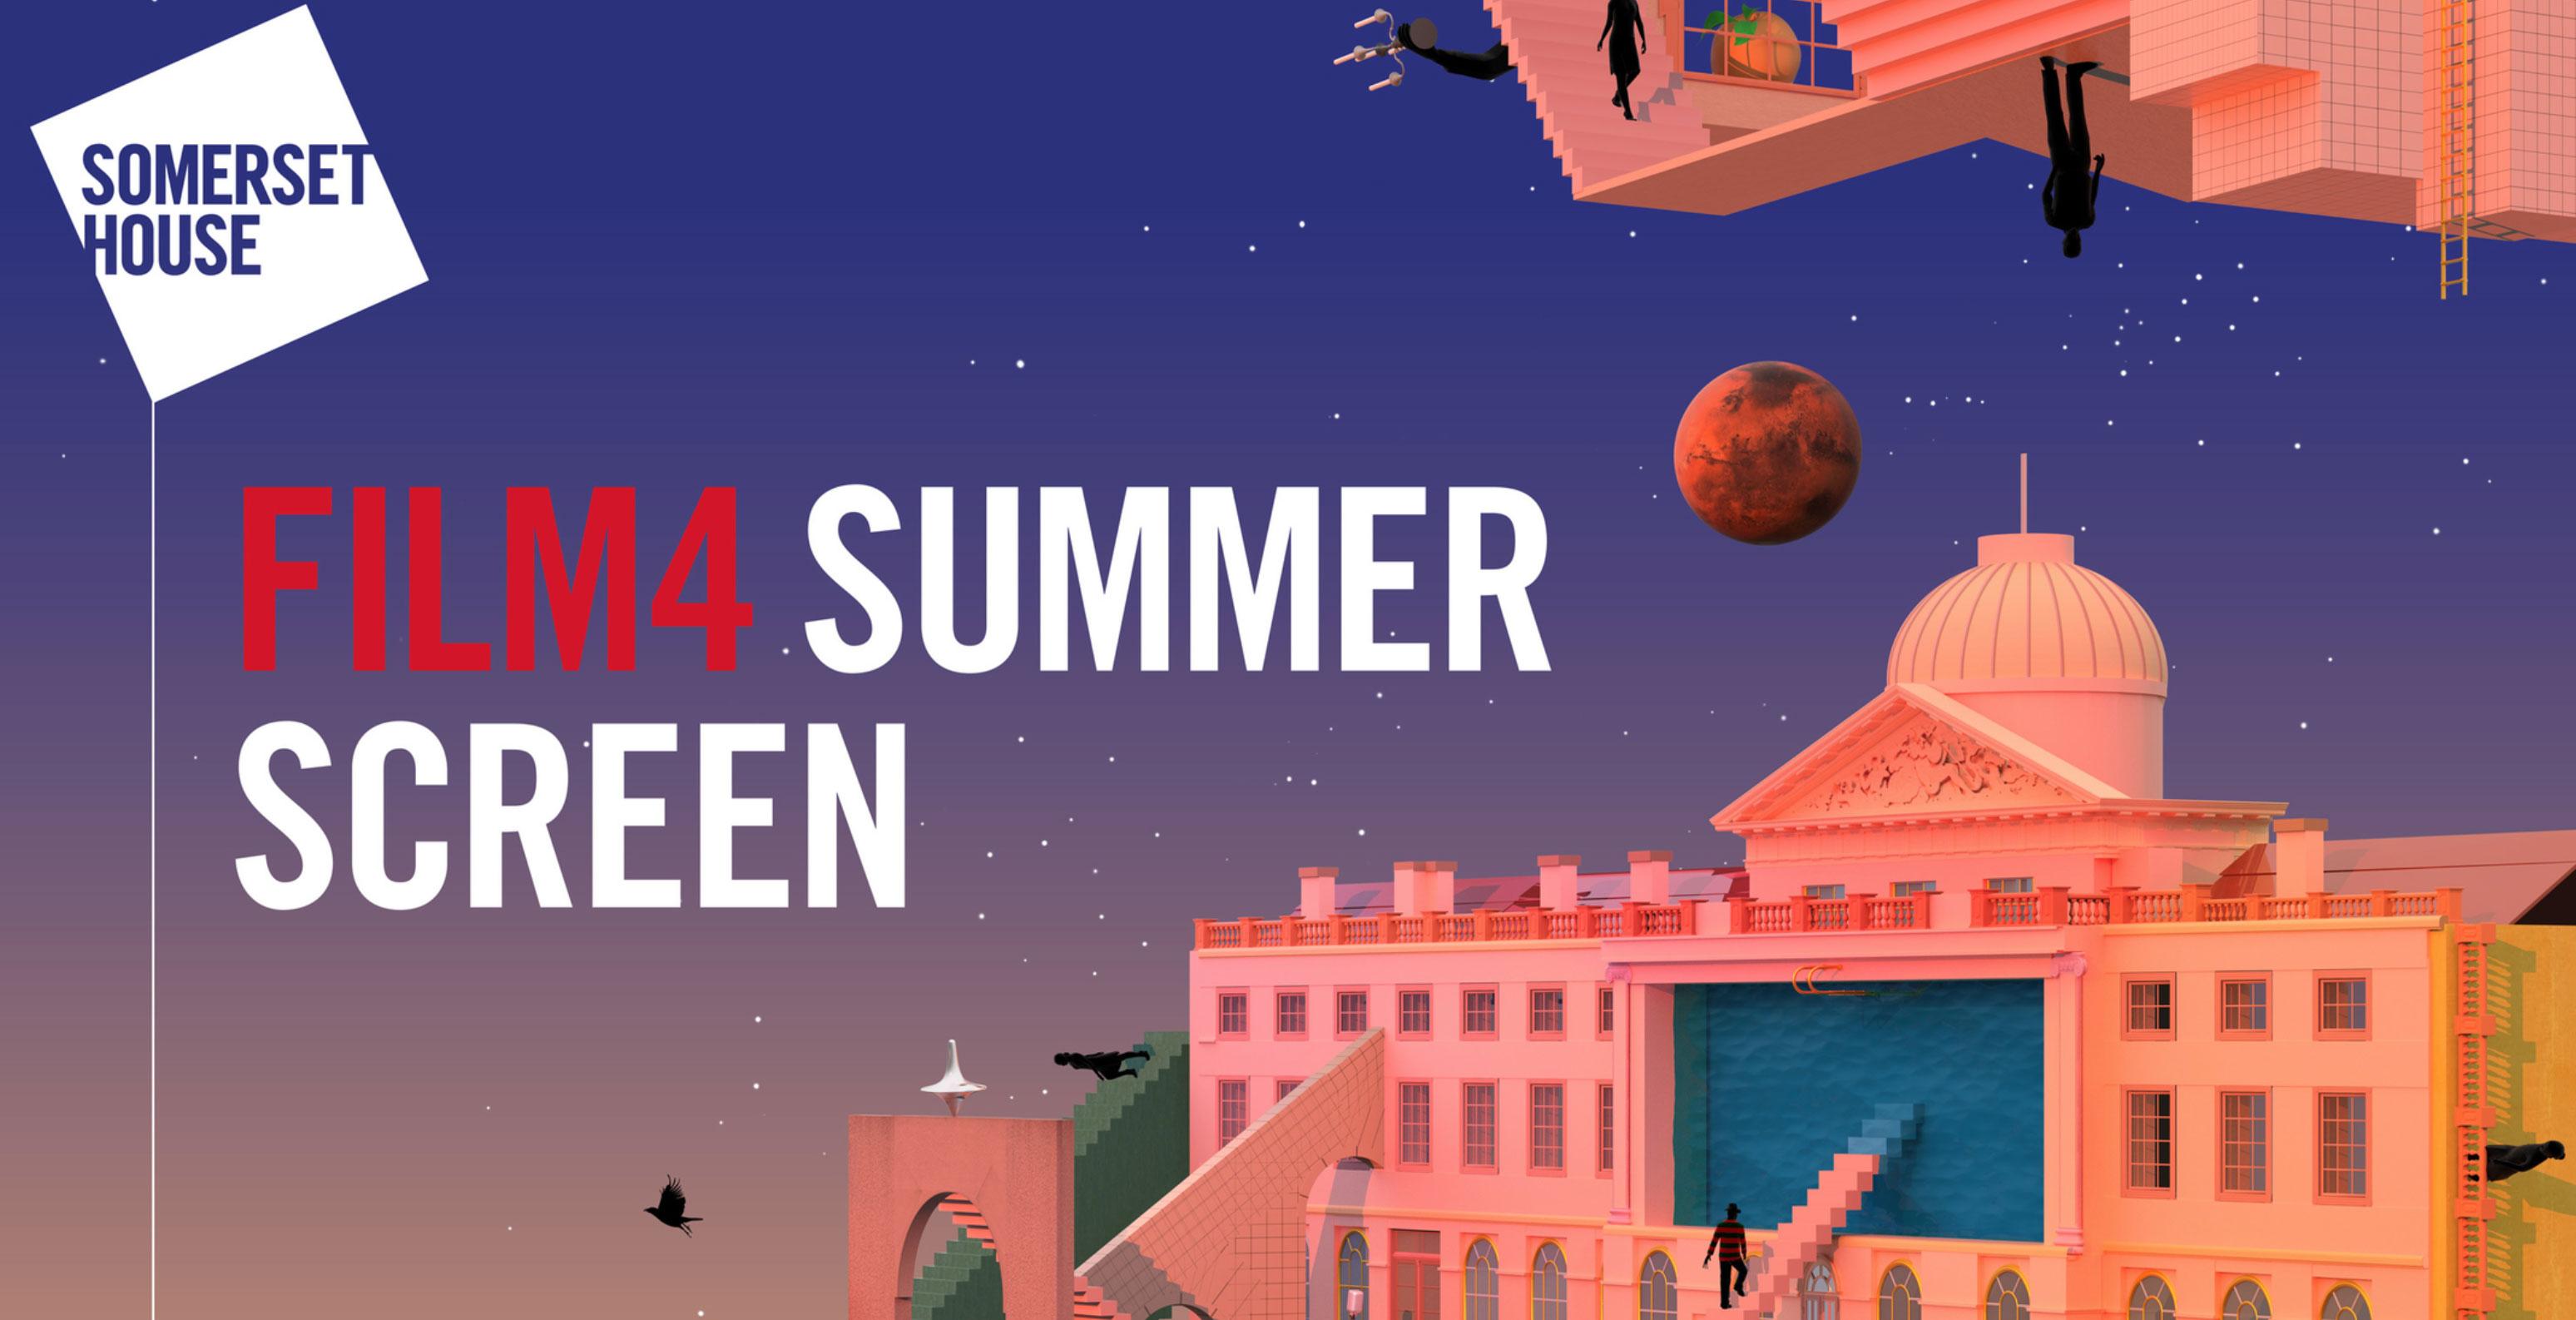 film 4 summer screen campaign